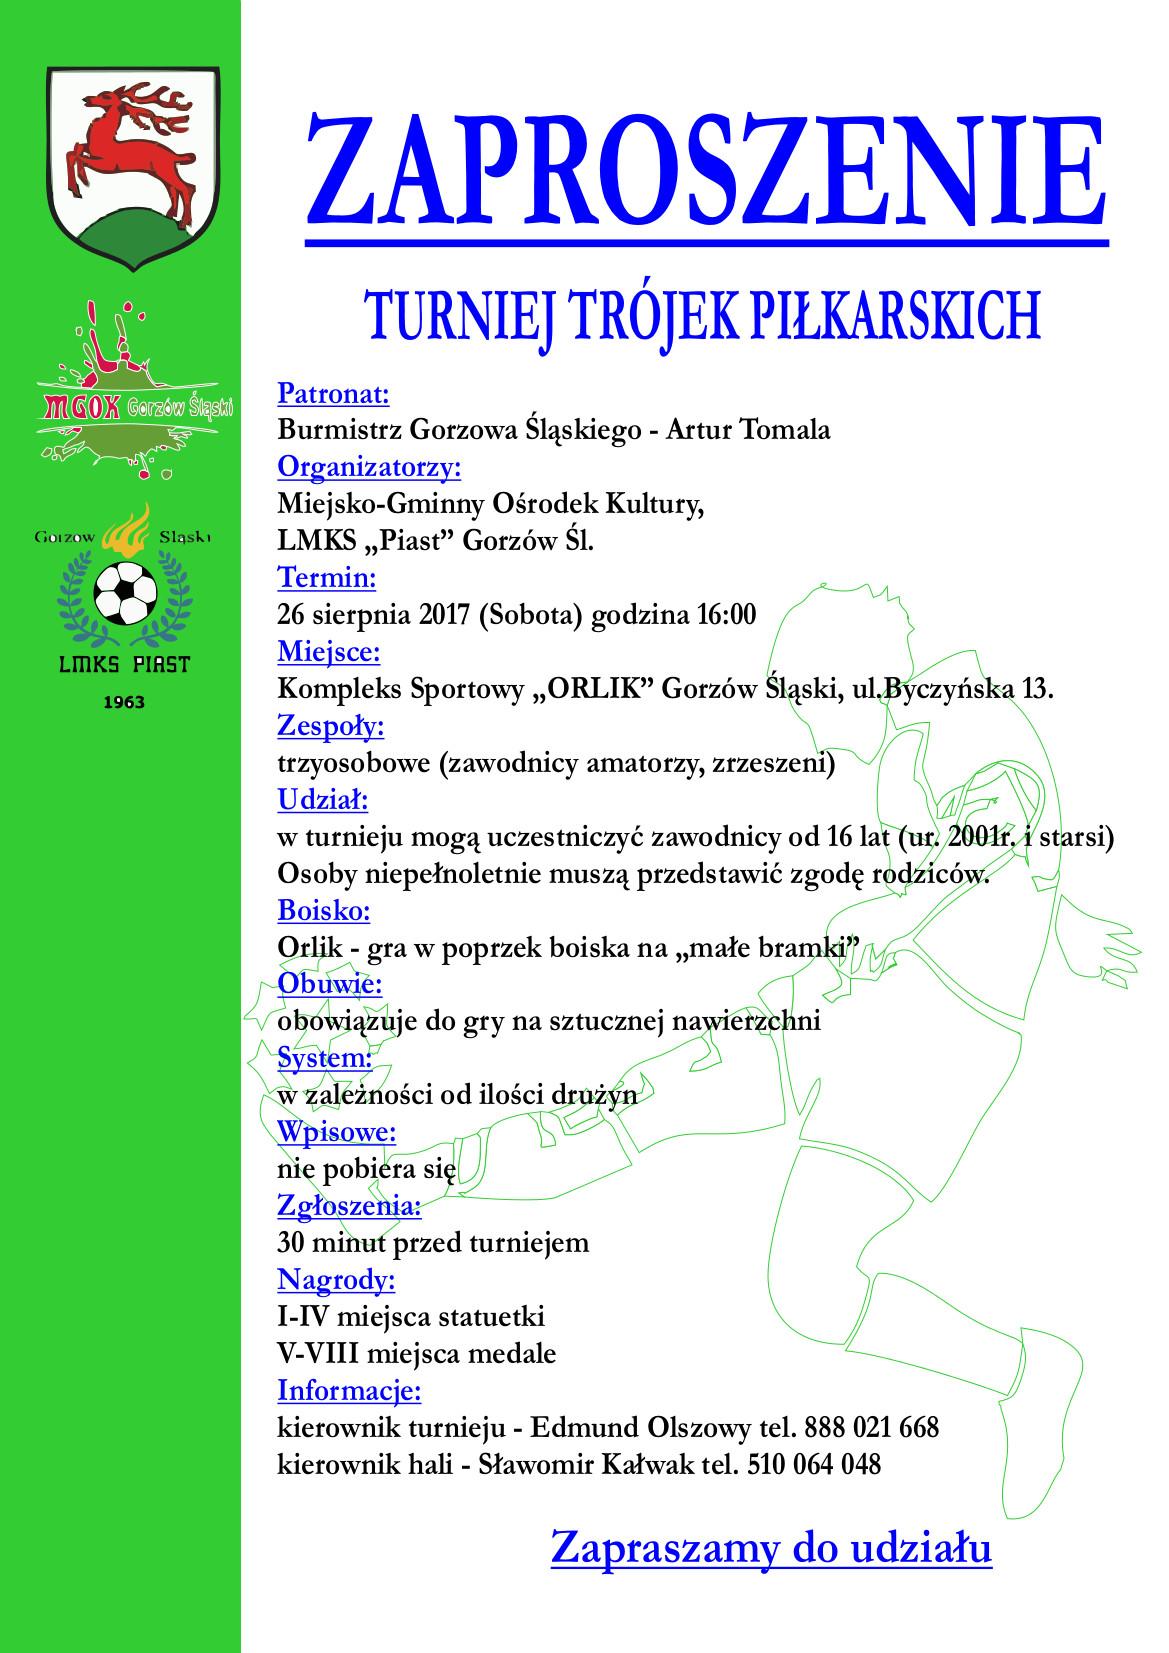 turniej_trojek_pilkarskich